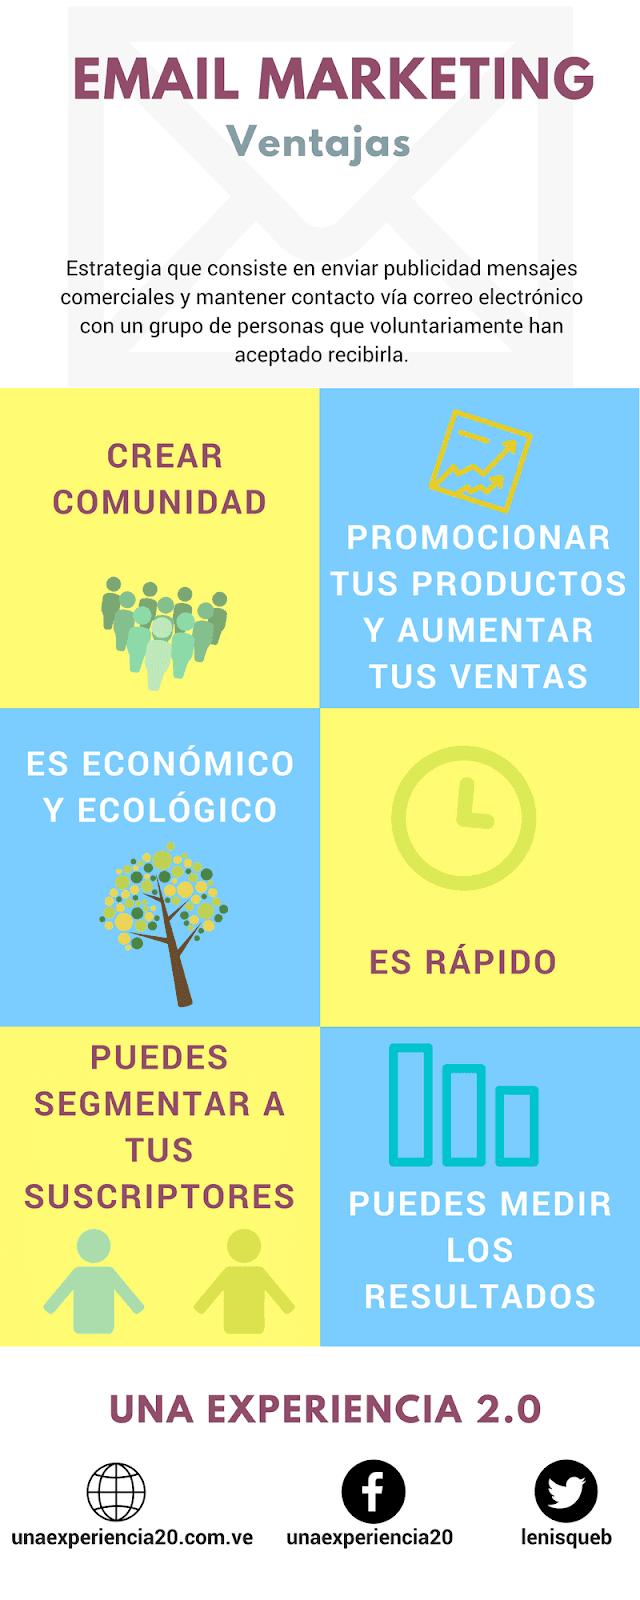 Infografia-email-marketing-ventajas